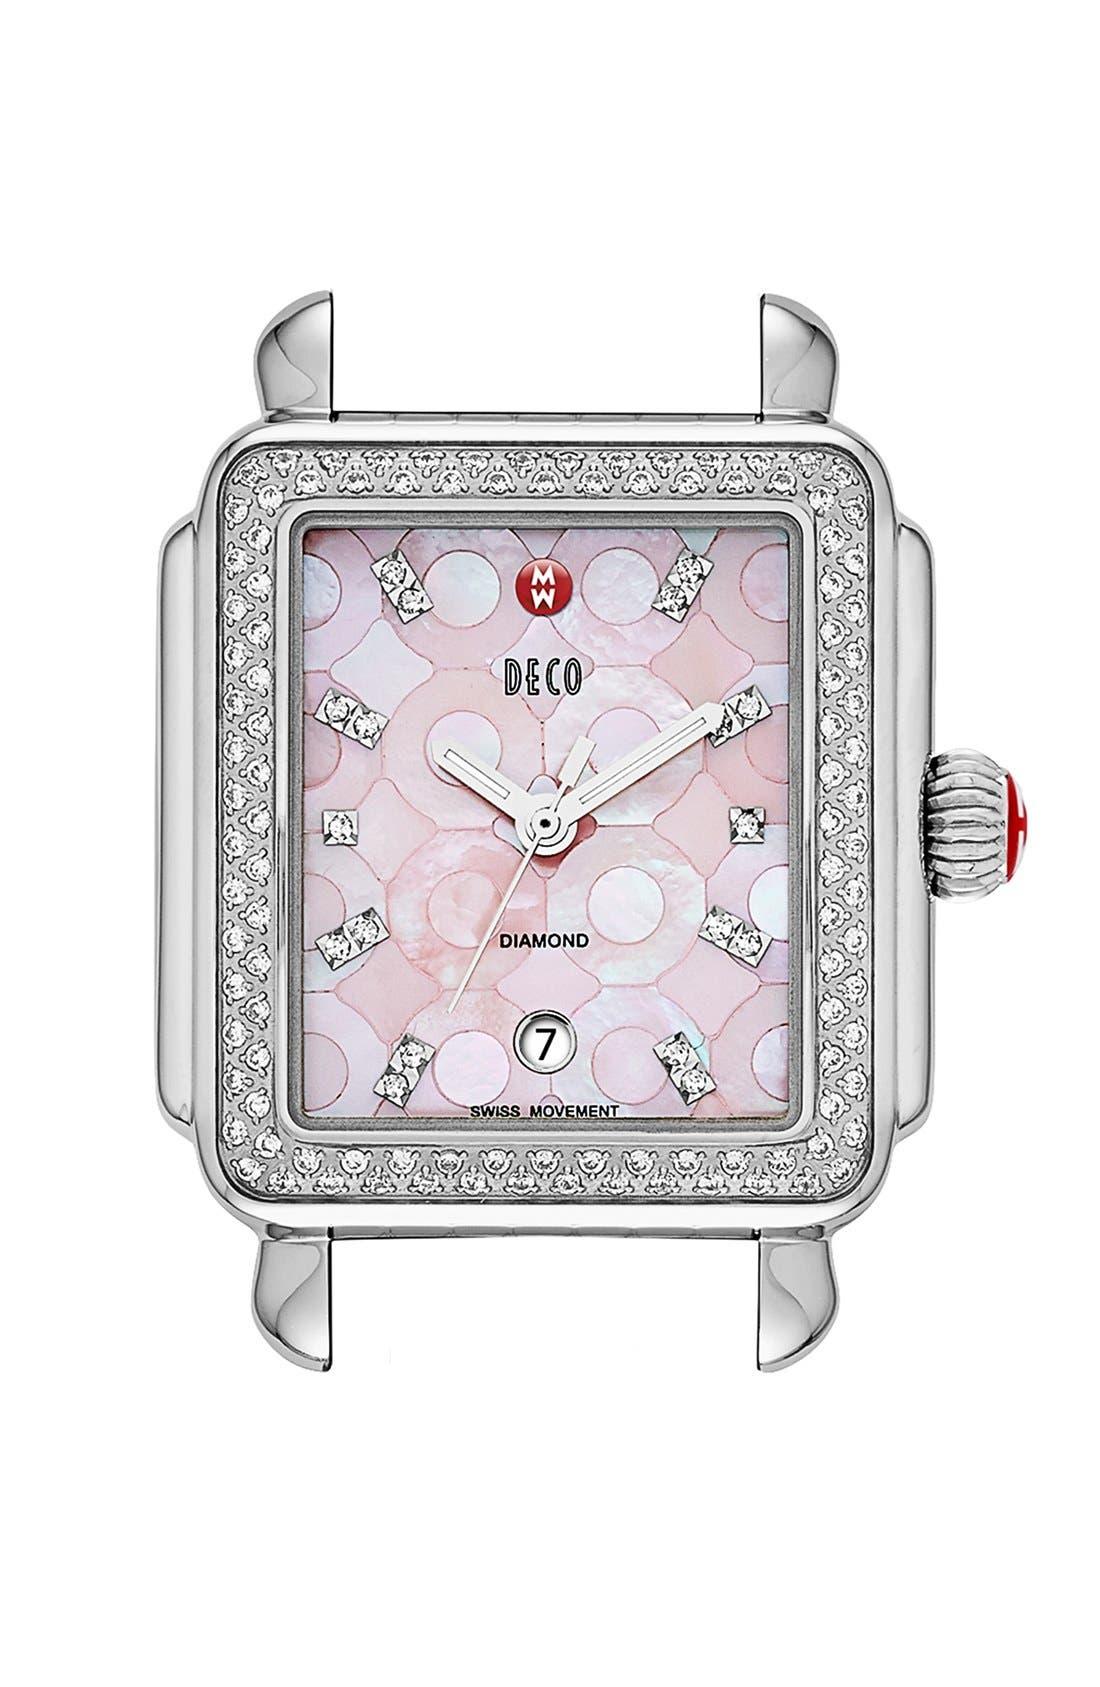 Main Image - MICHELE 'Deco Diamond' Pink Mosaic Dial Watch Case, 33mm x 35mm